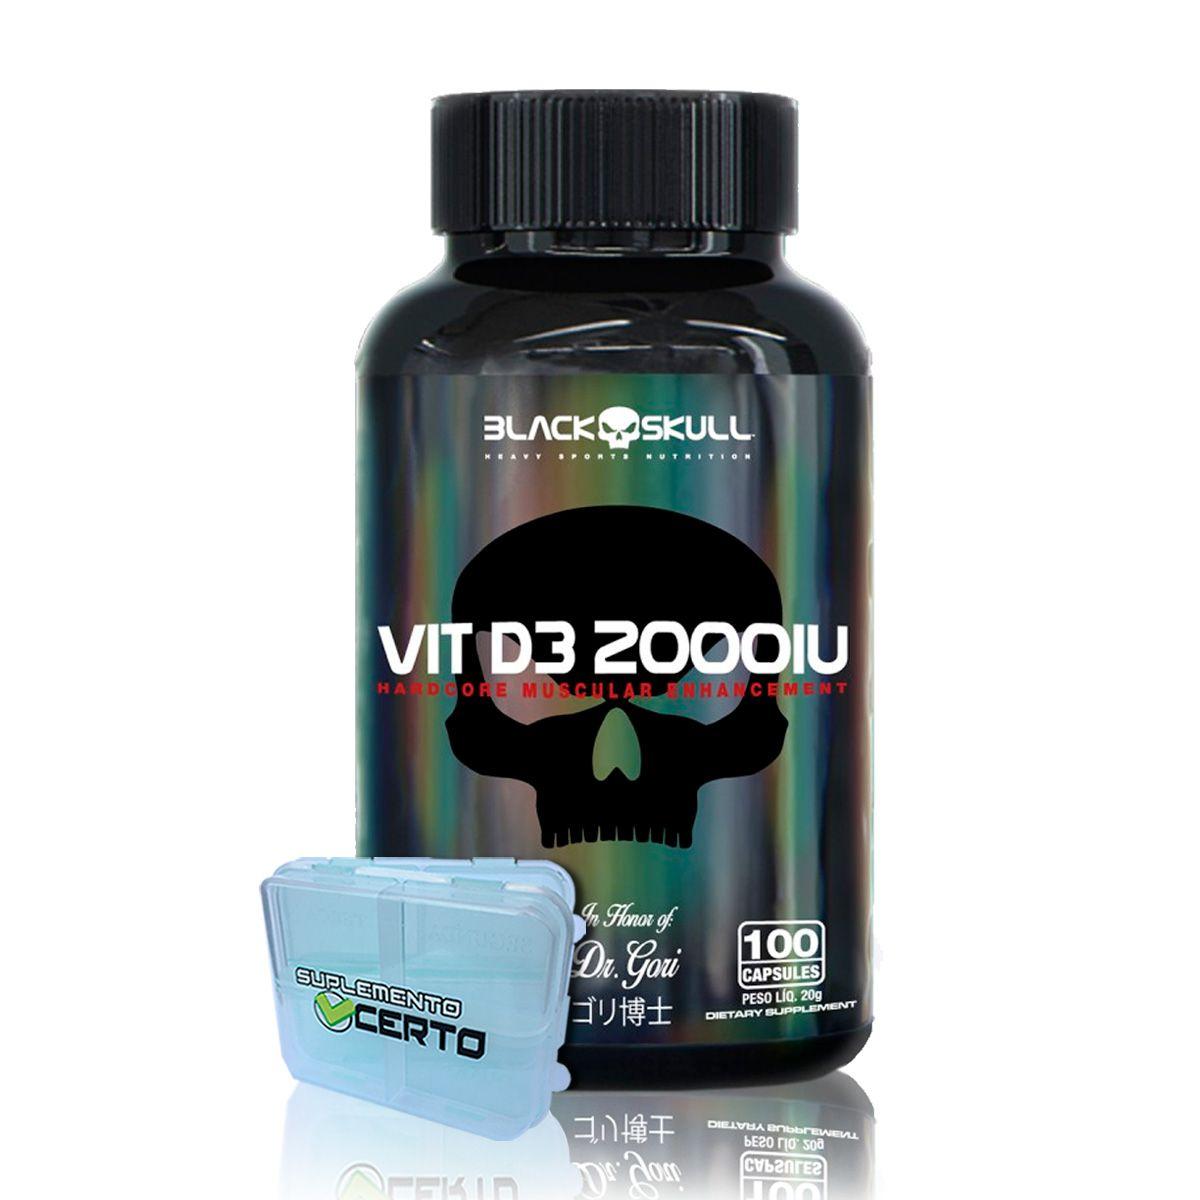 Vitamina D3 100 Cápsulas (Vit D3 2000IU) - Black Skull